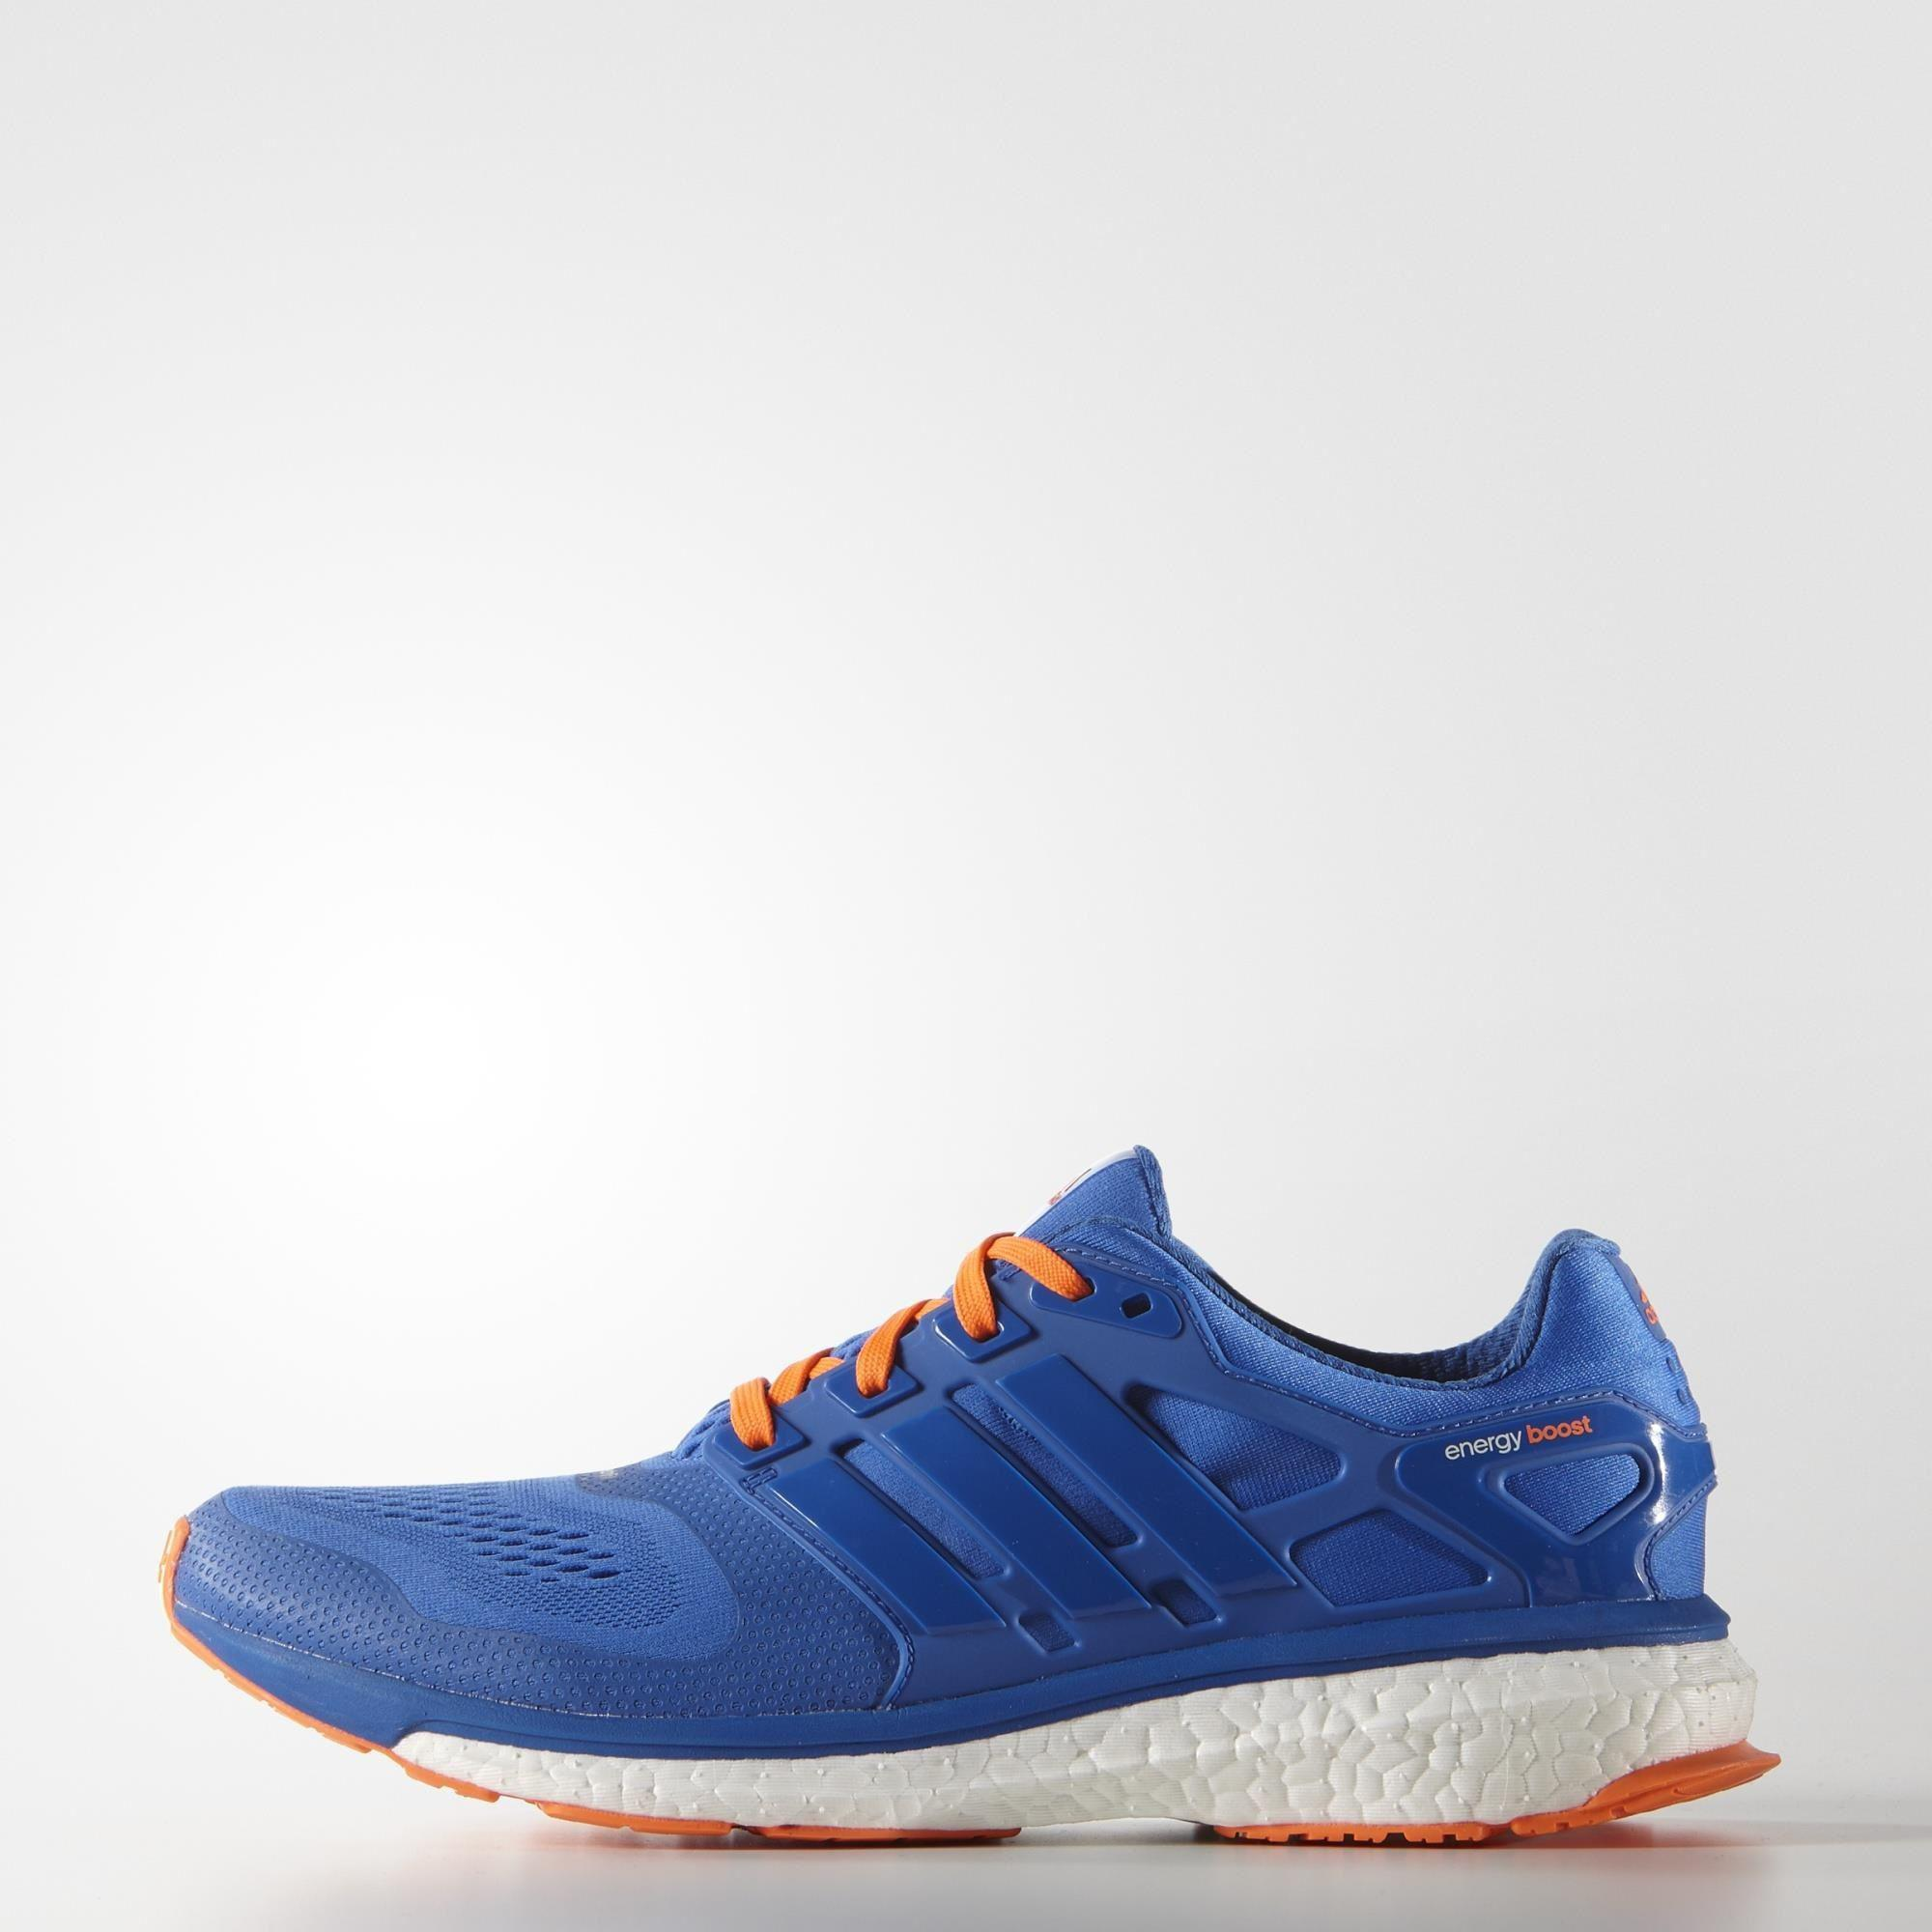 buy popular 1fd1d 68bda Adidas Mens Energy Boost ESM Running Shoes - BlueOrange - Tennisnuts.com